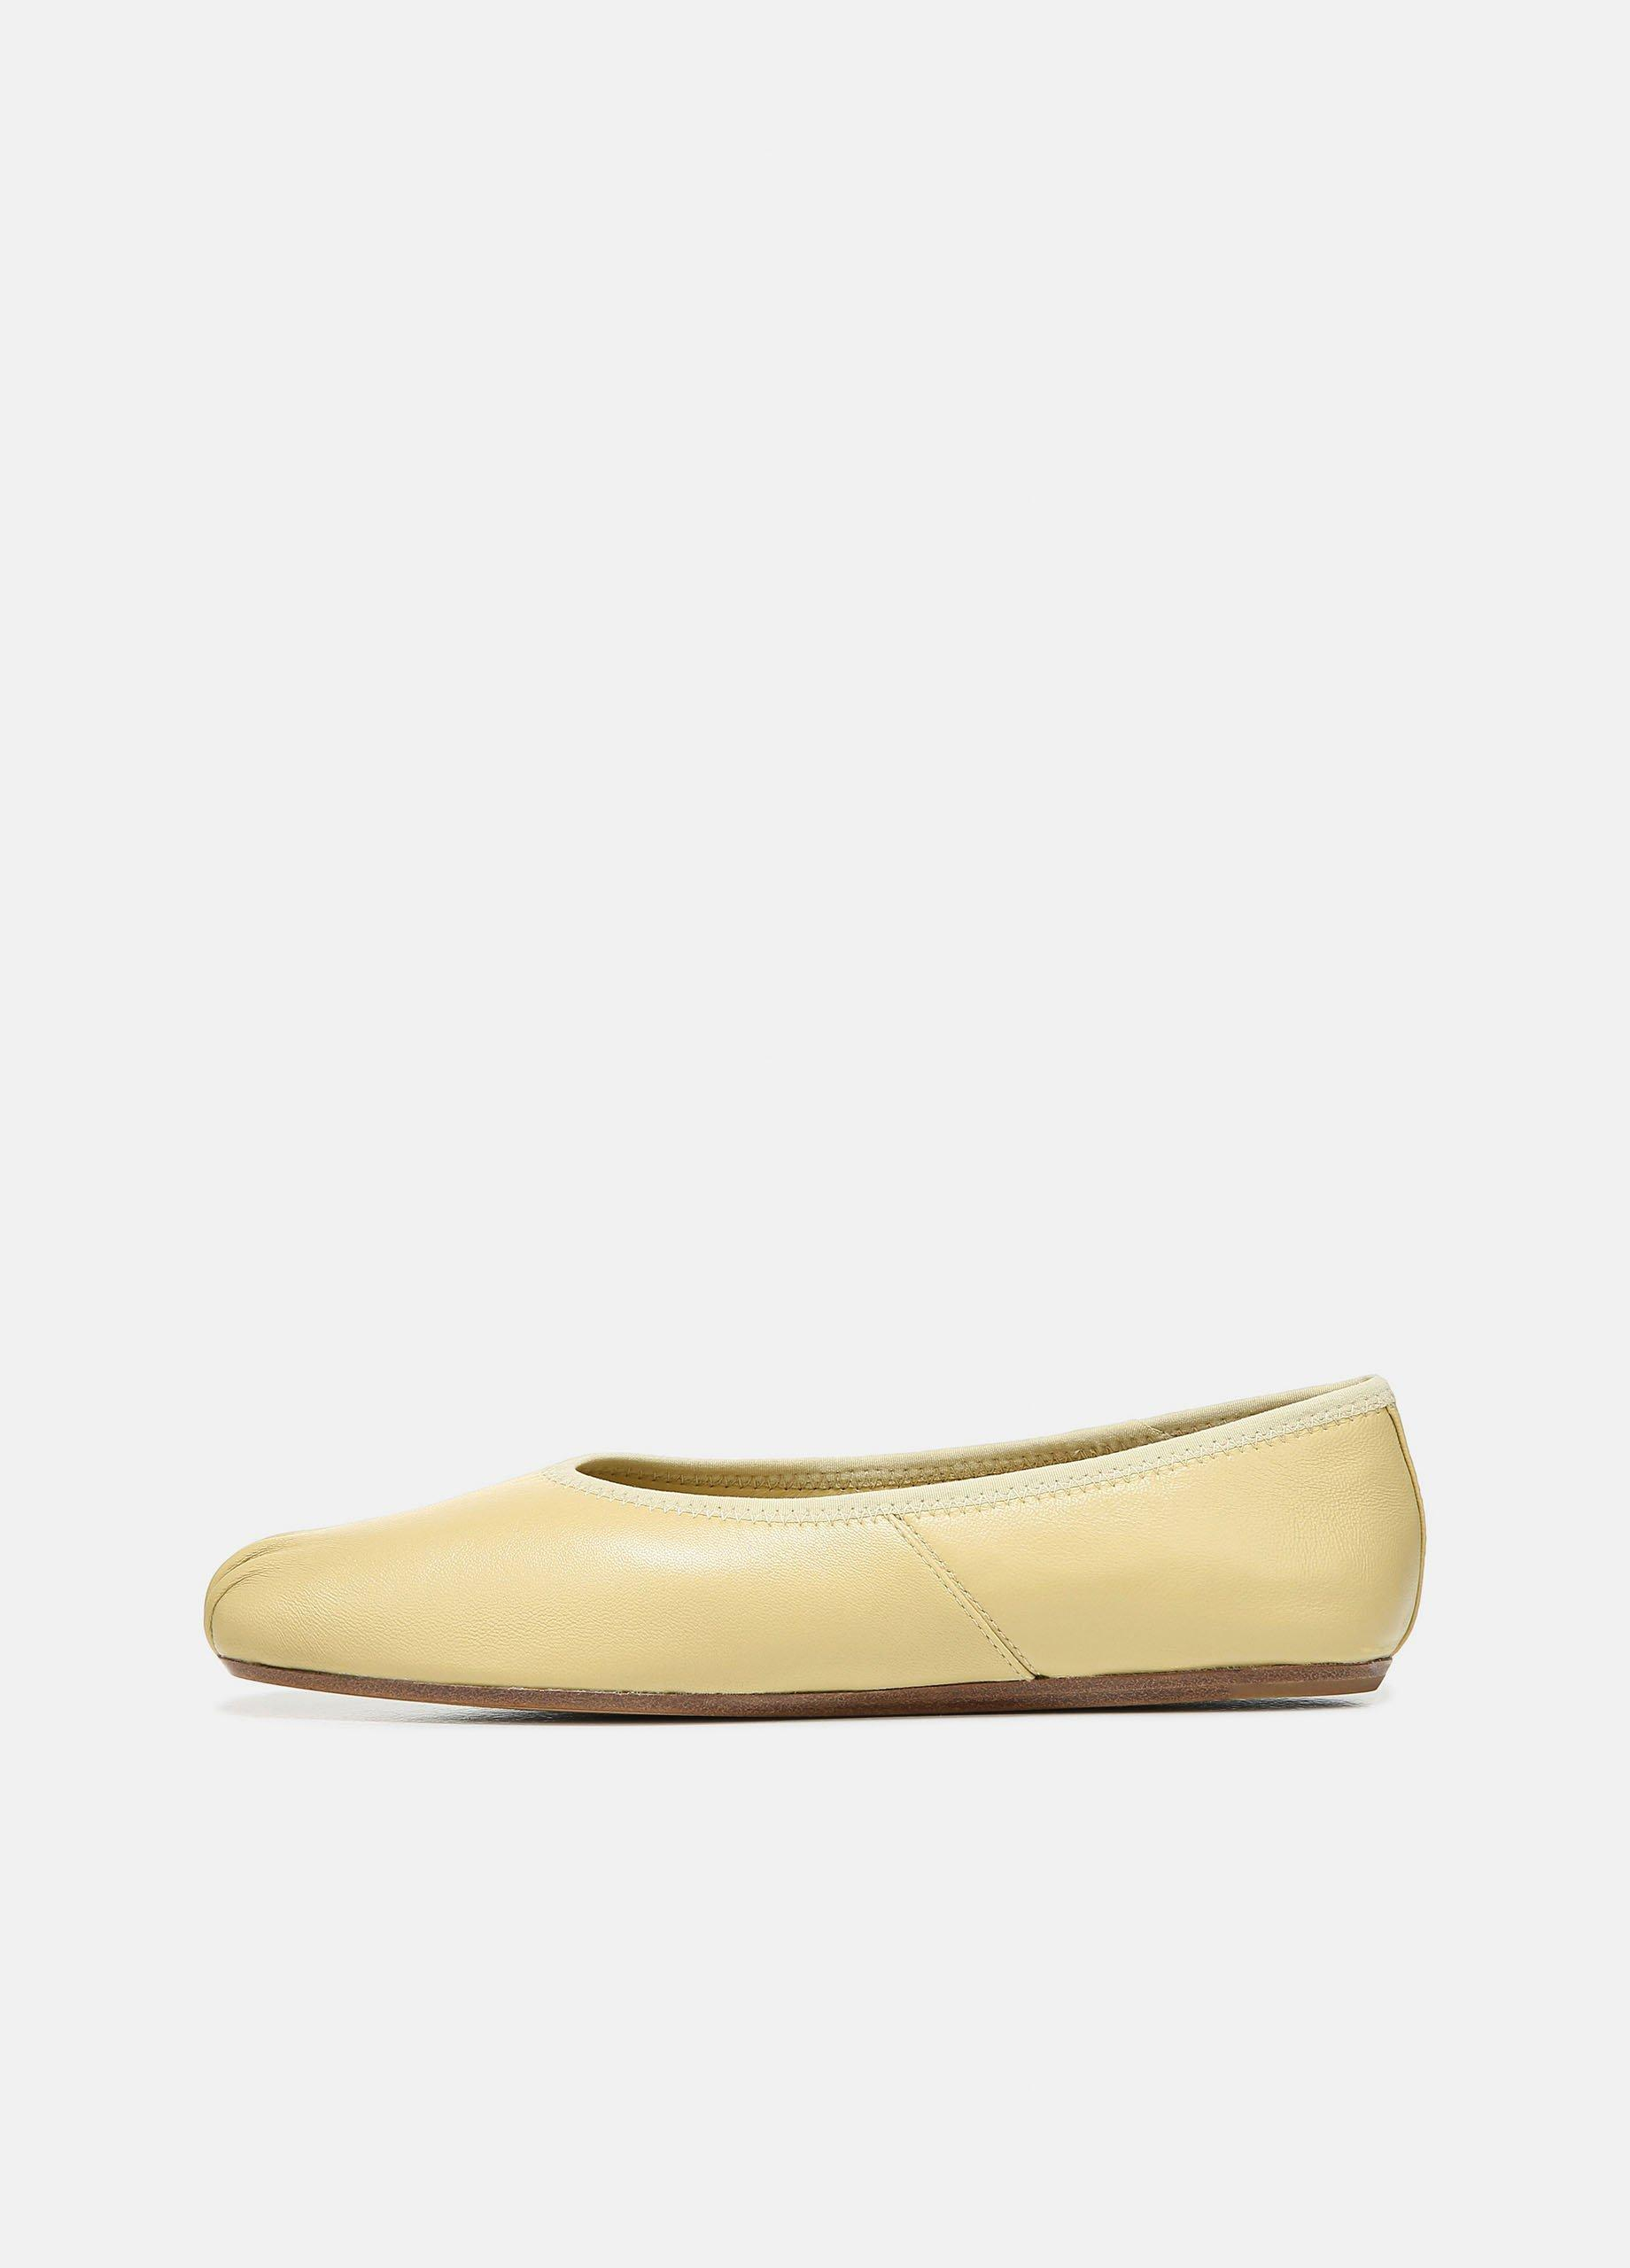 Kiana Leather Flat